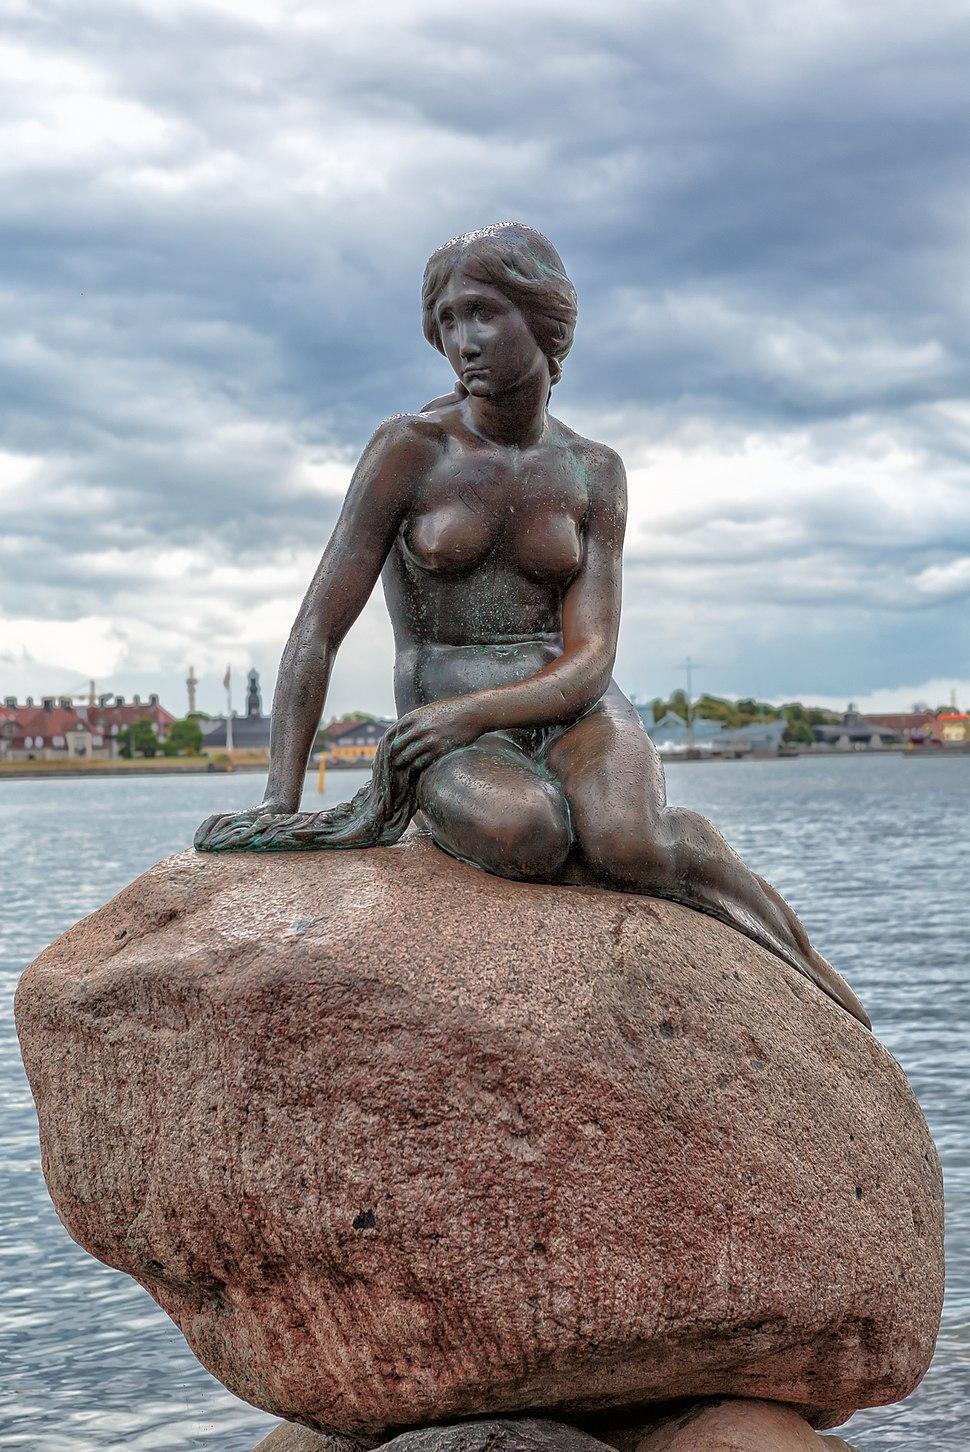 Copenhagen - the little mermaid statue - 2013